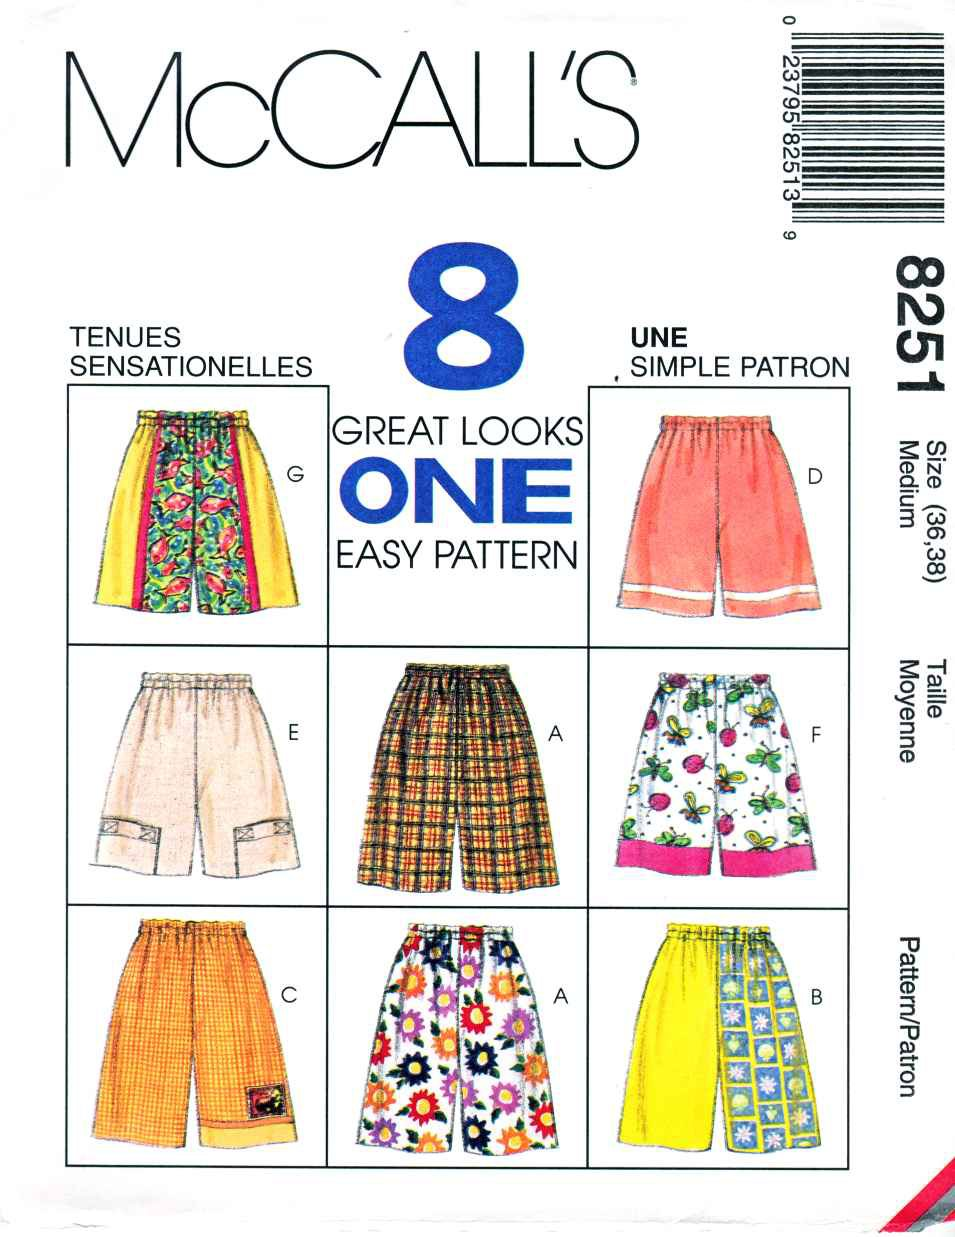 McCalls Sewing Pattern 8251 Misses Men's Unisex Size Large Easy Shorts Length Trim Options